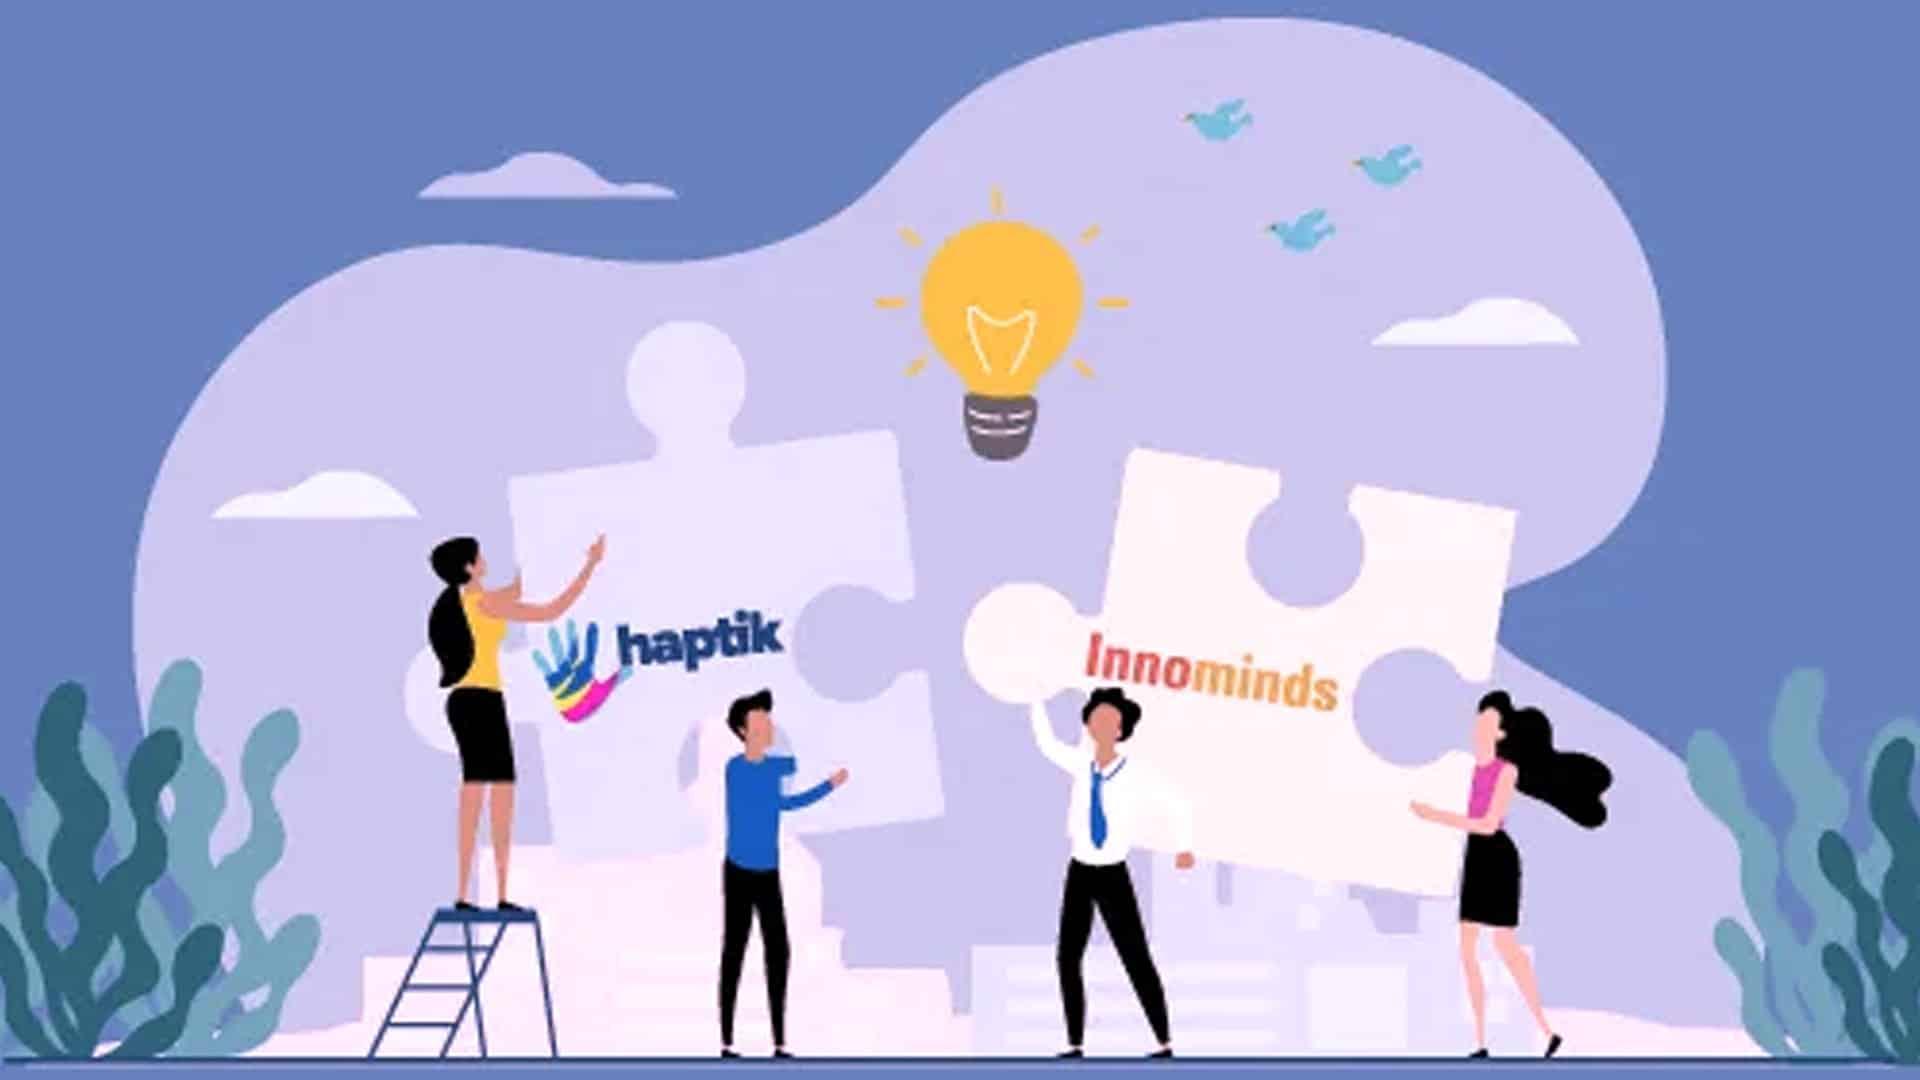 Innominds Partners with Haptik_mybigplunge02